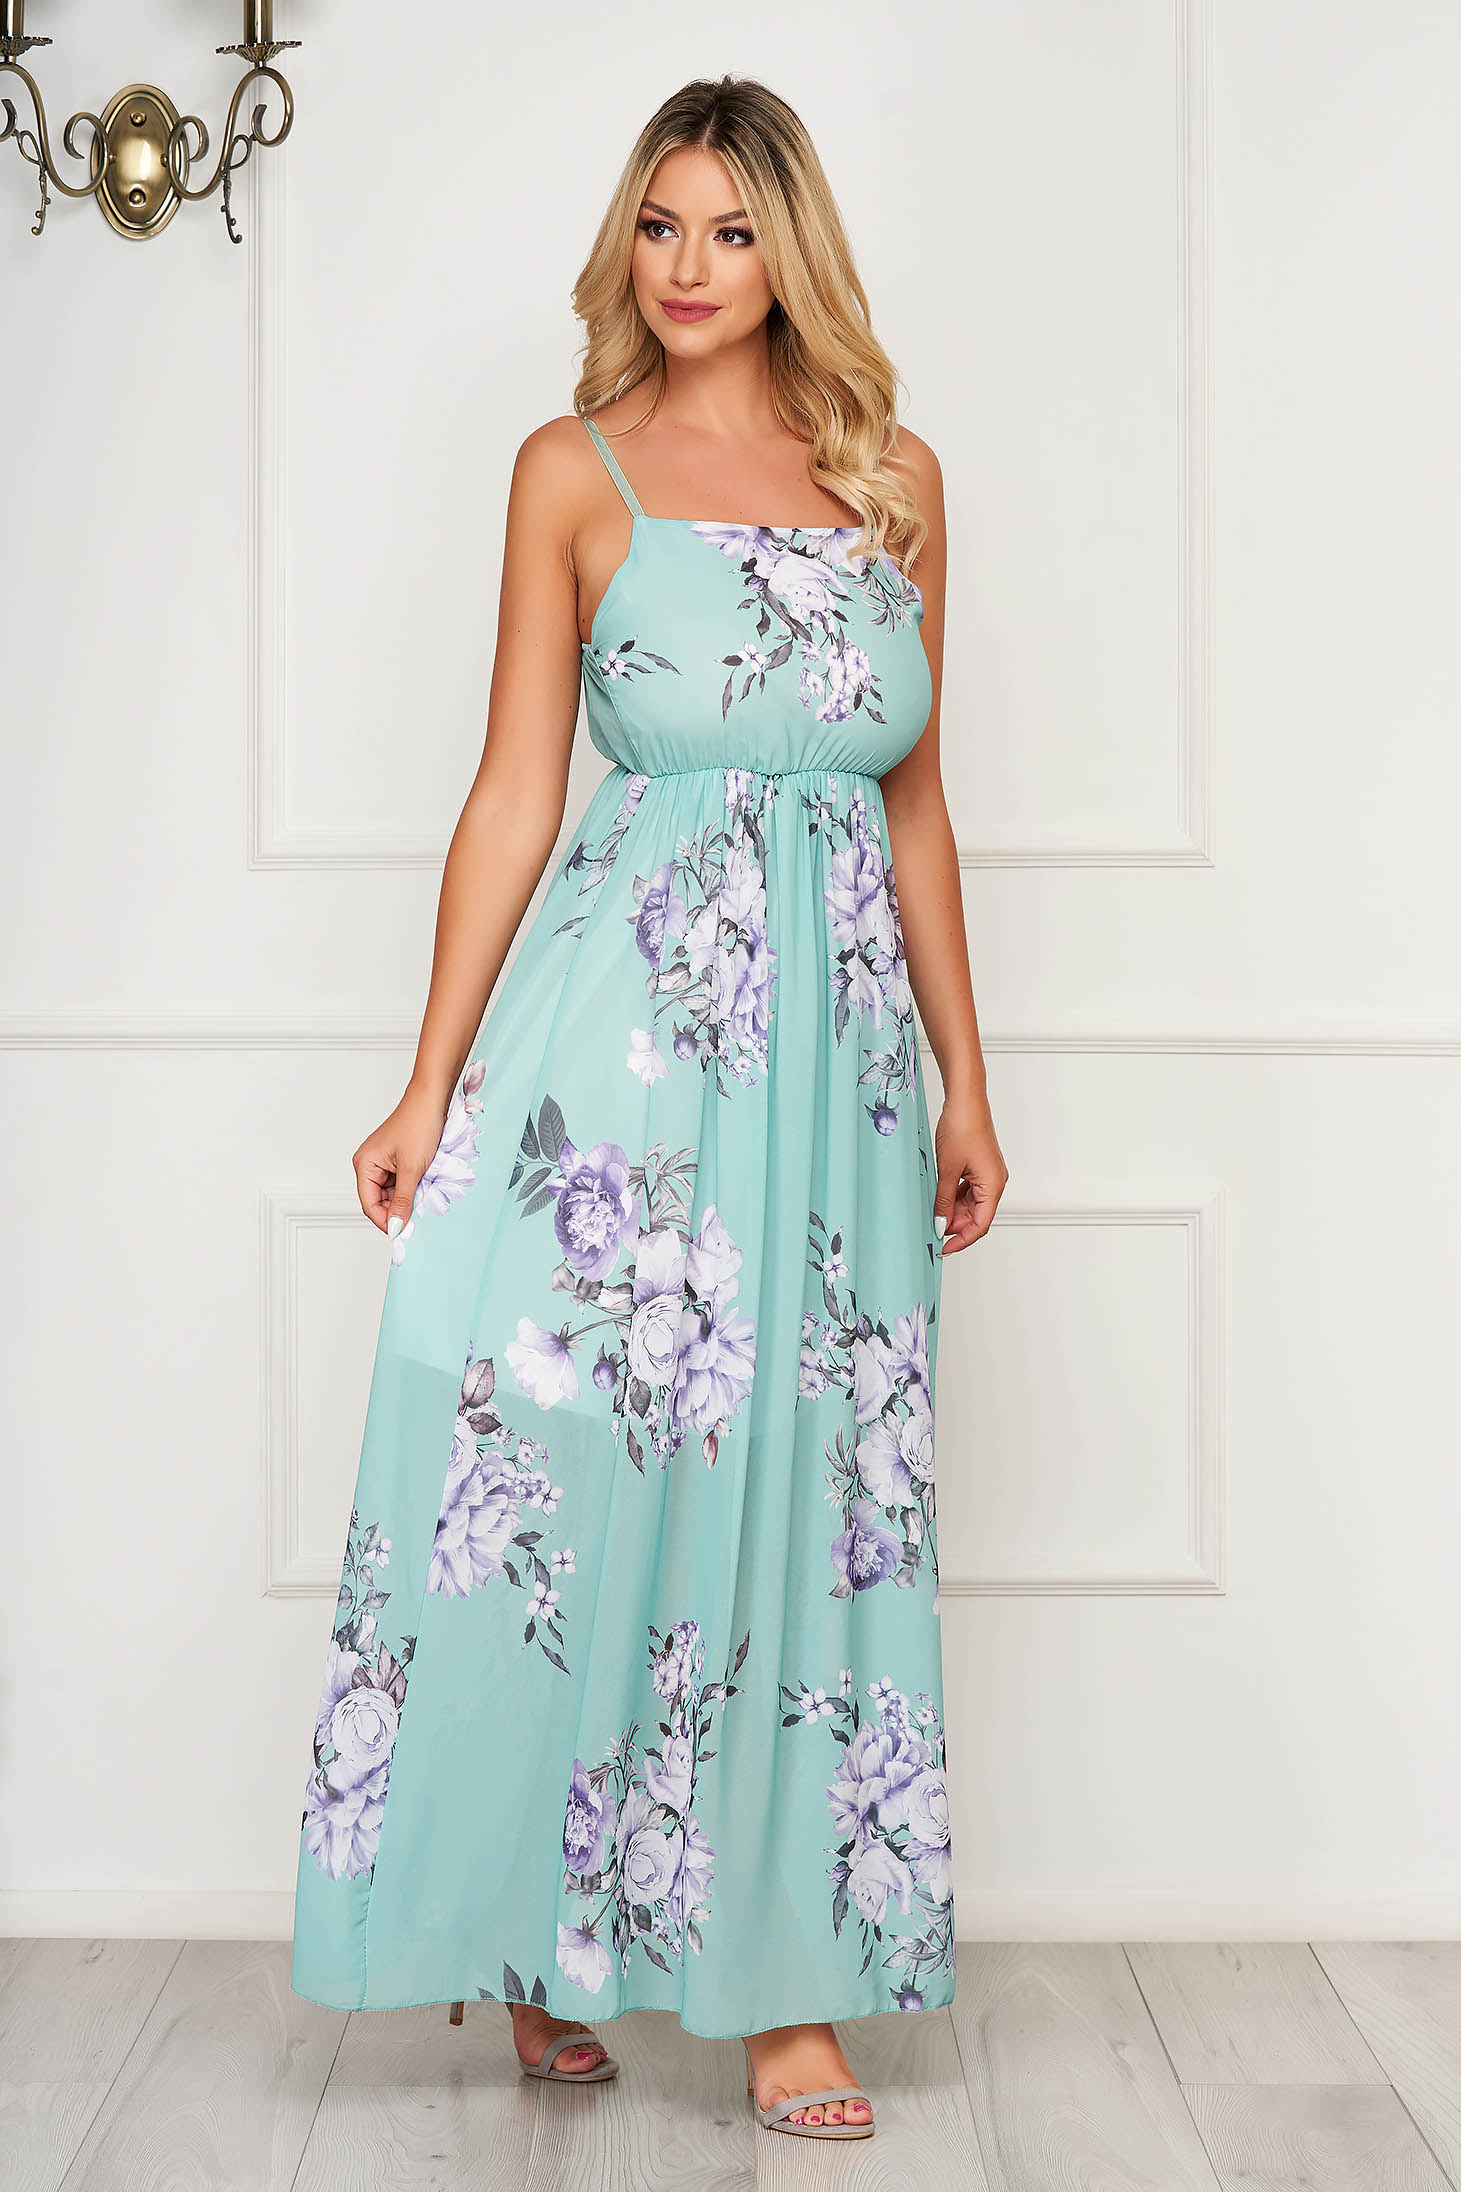 Lightgreen dress long daily sleeveless thin fabric cloche with elastic waist